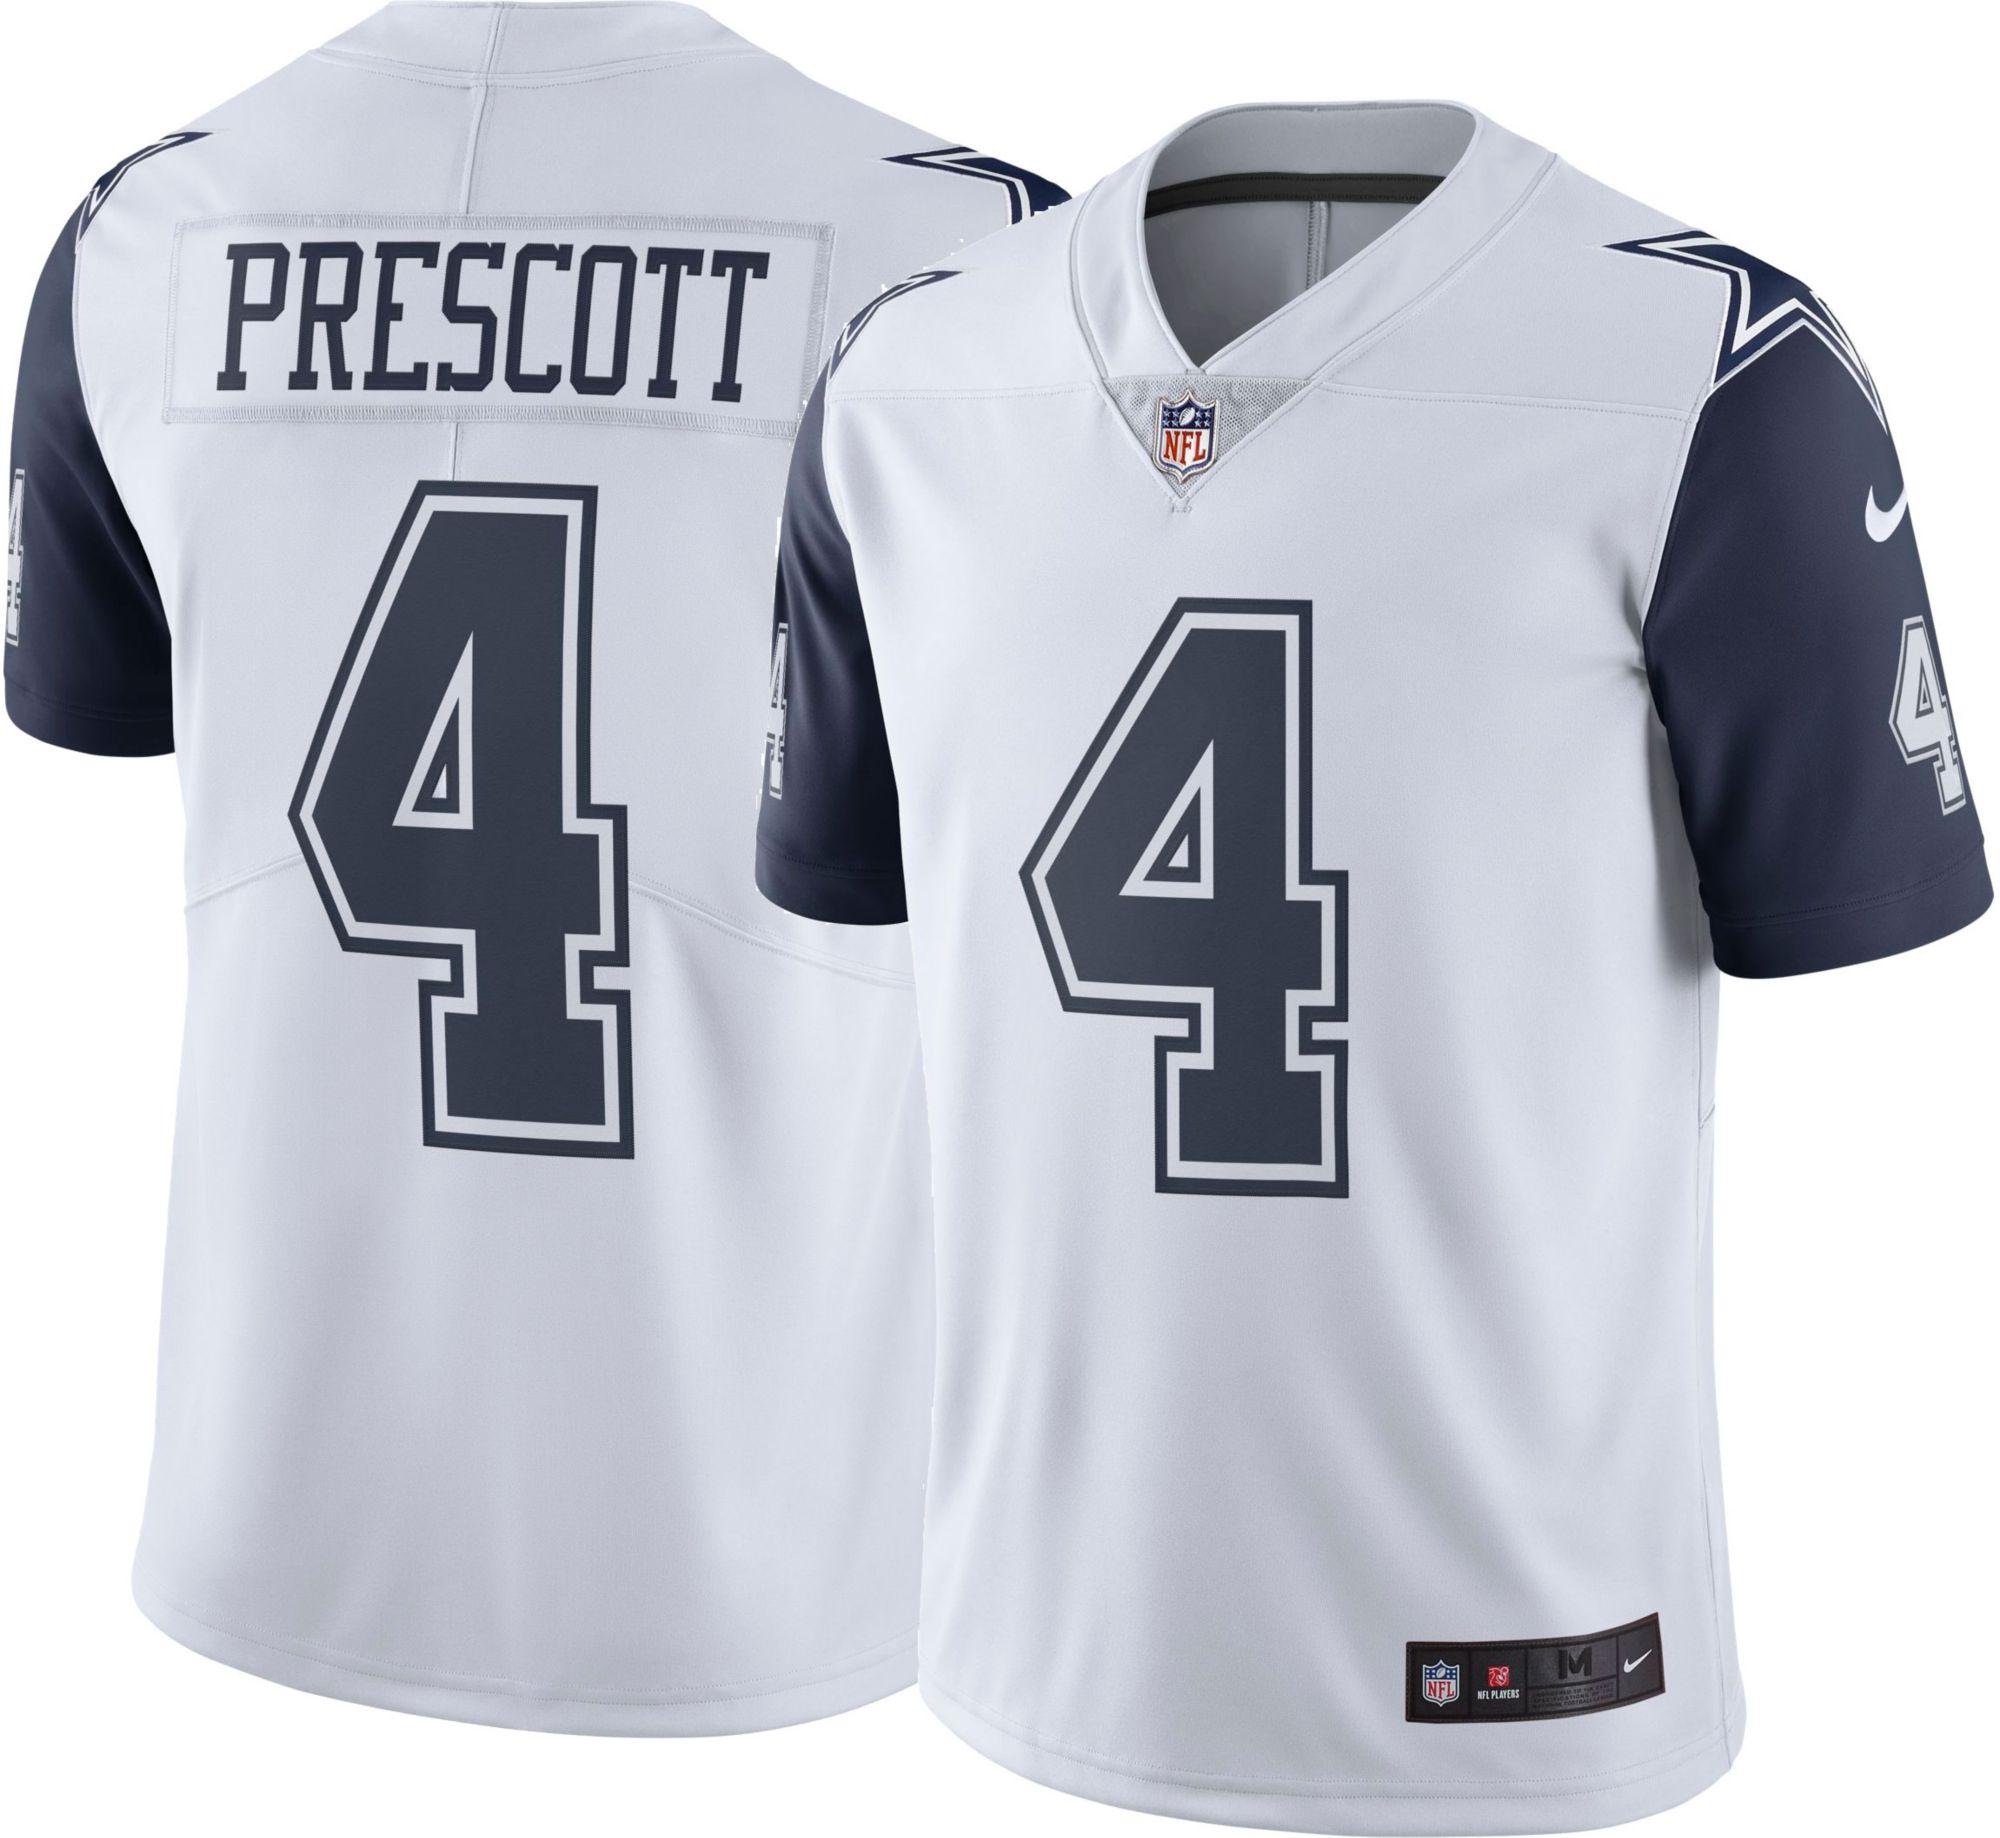 huge discount 25aa4 49a67 4t dallas cowboys jersey